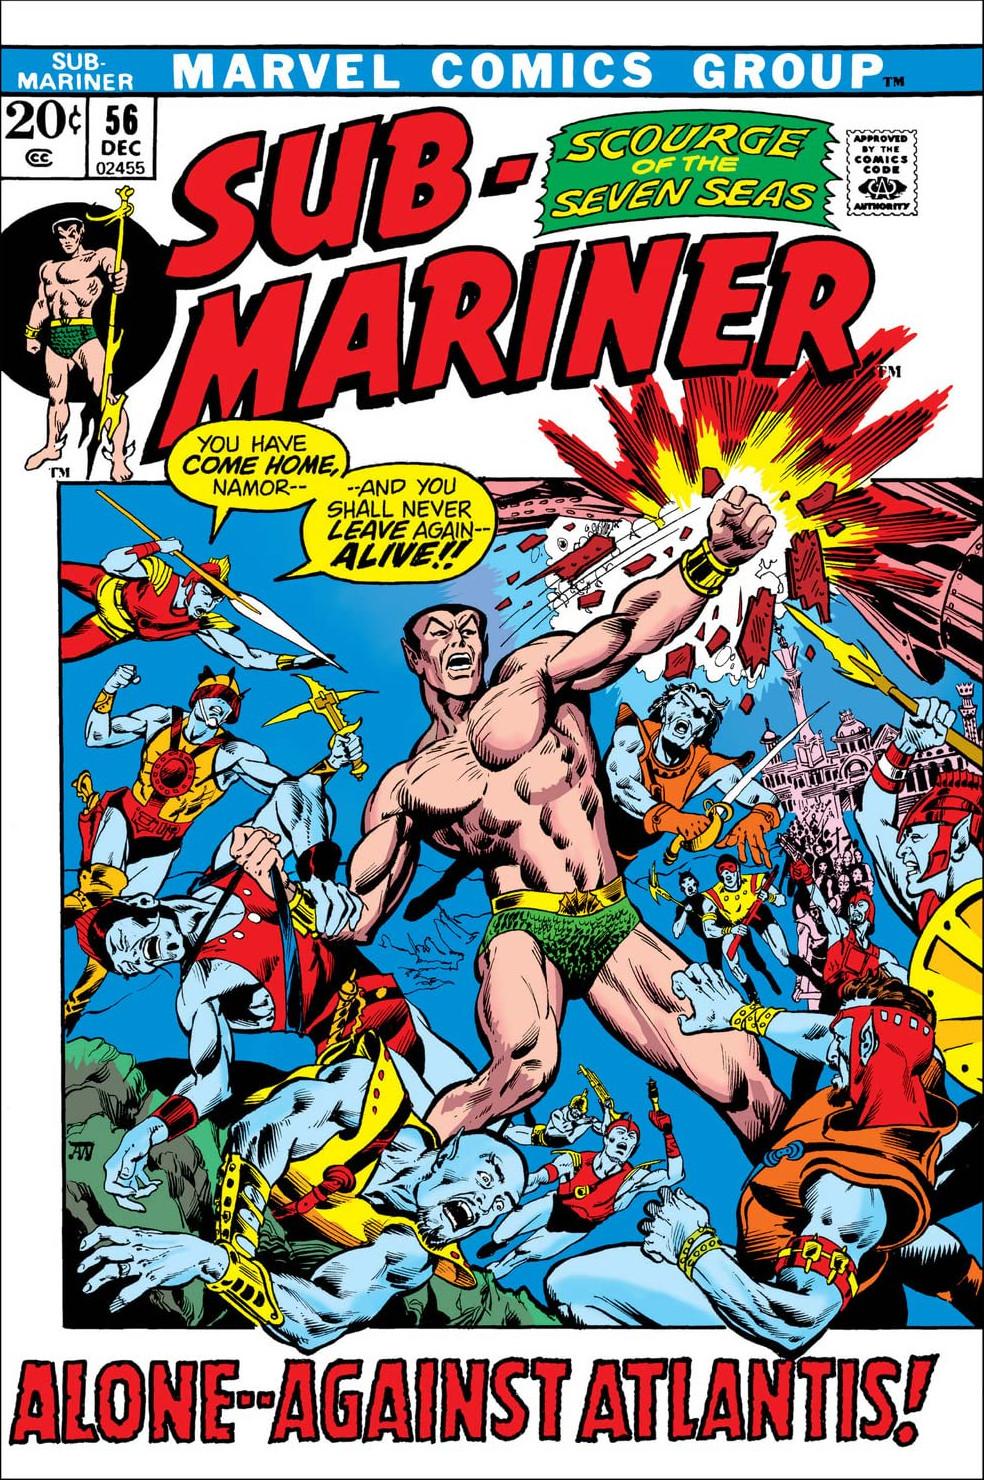 Sub-Mariner Vol 1 56